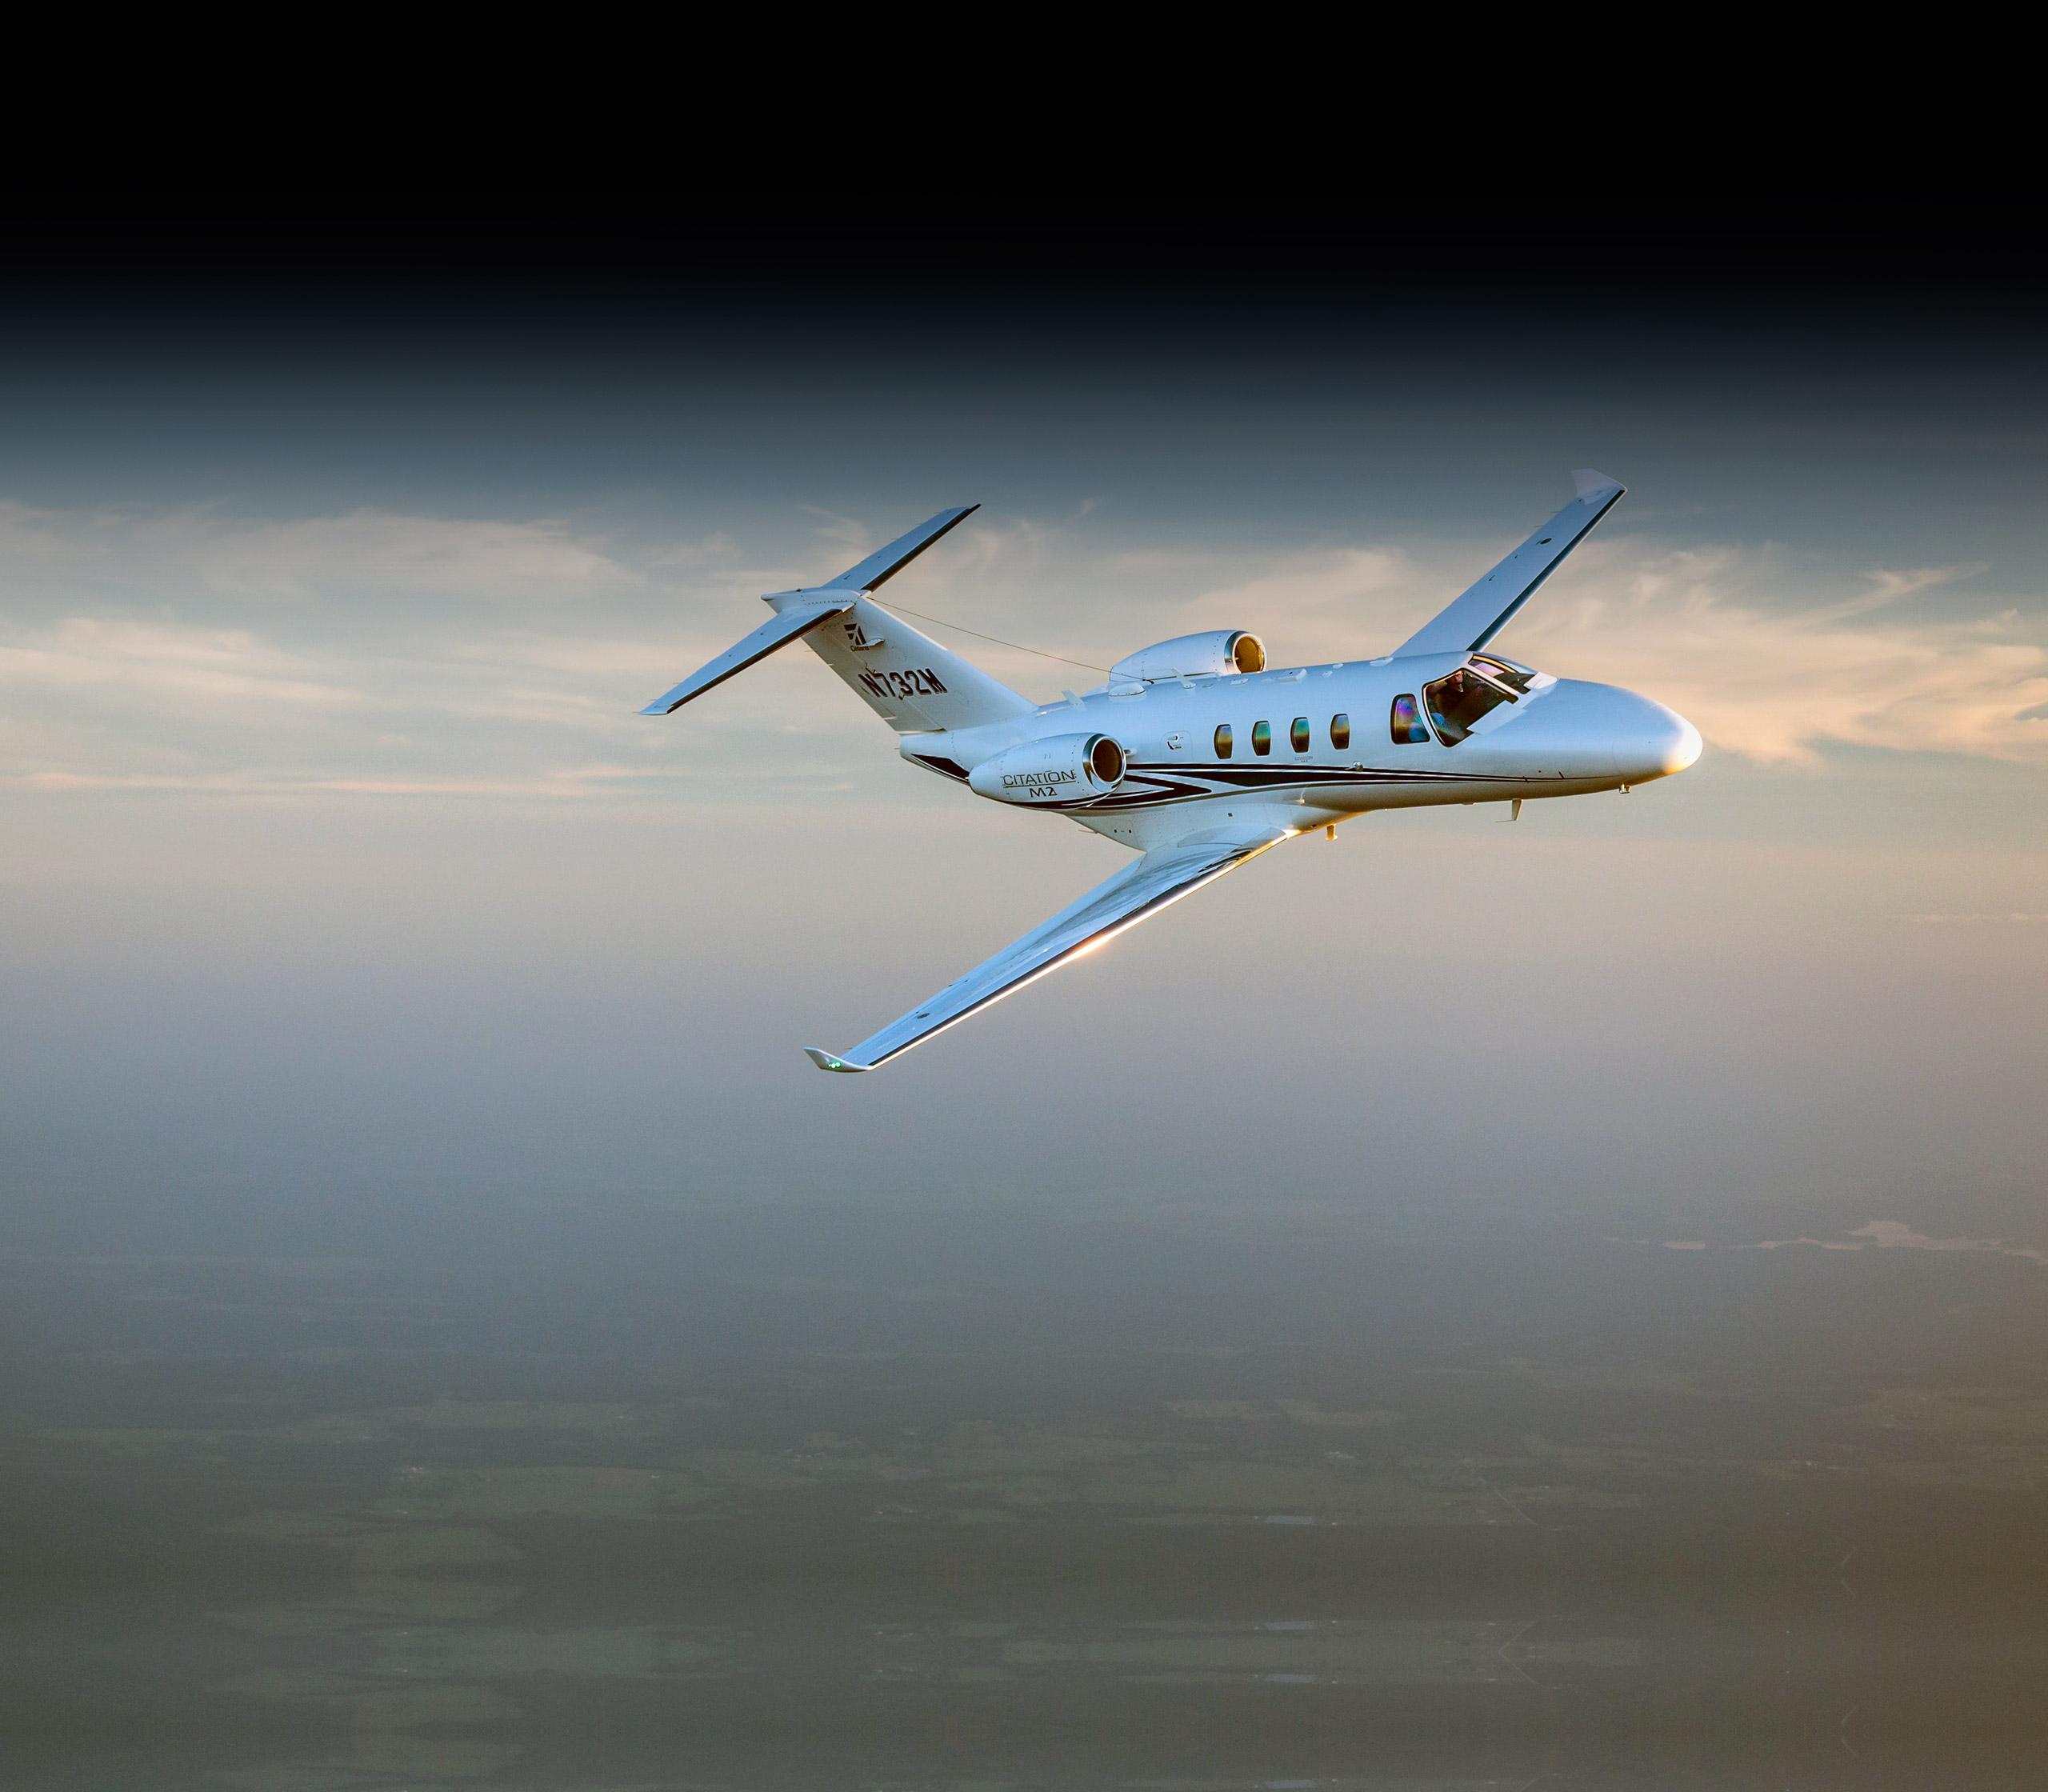 CJ Series CE-525/CE-525S: Jet Flight Training